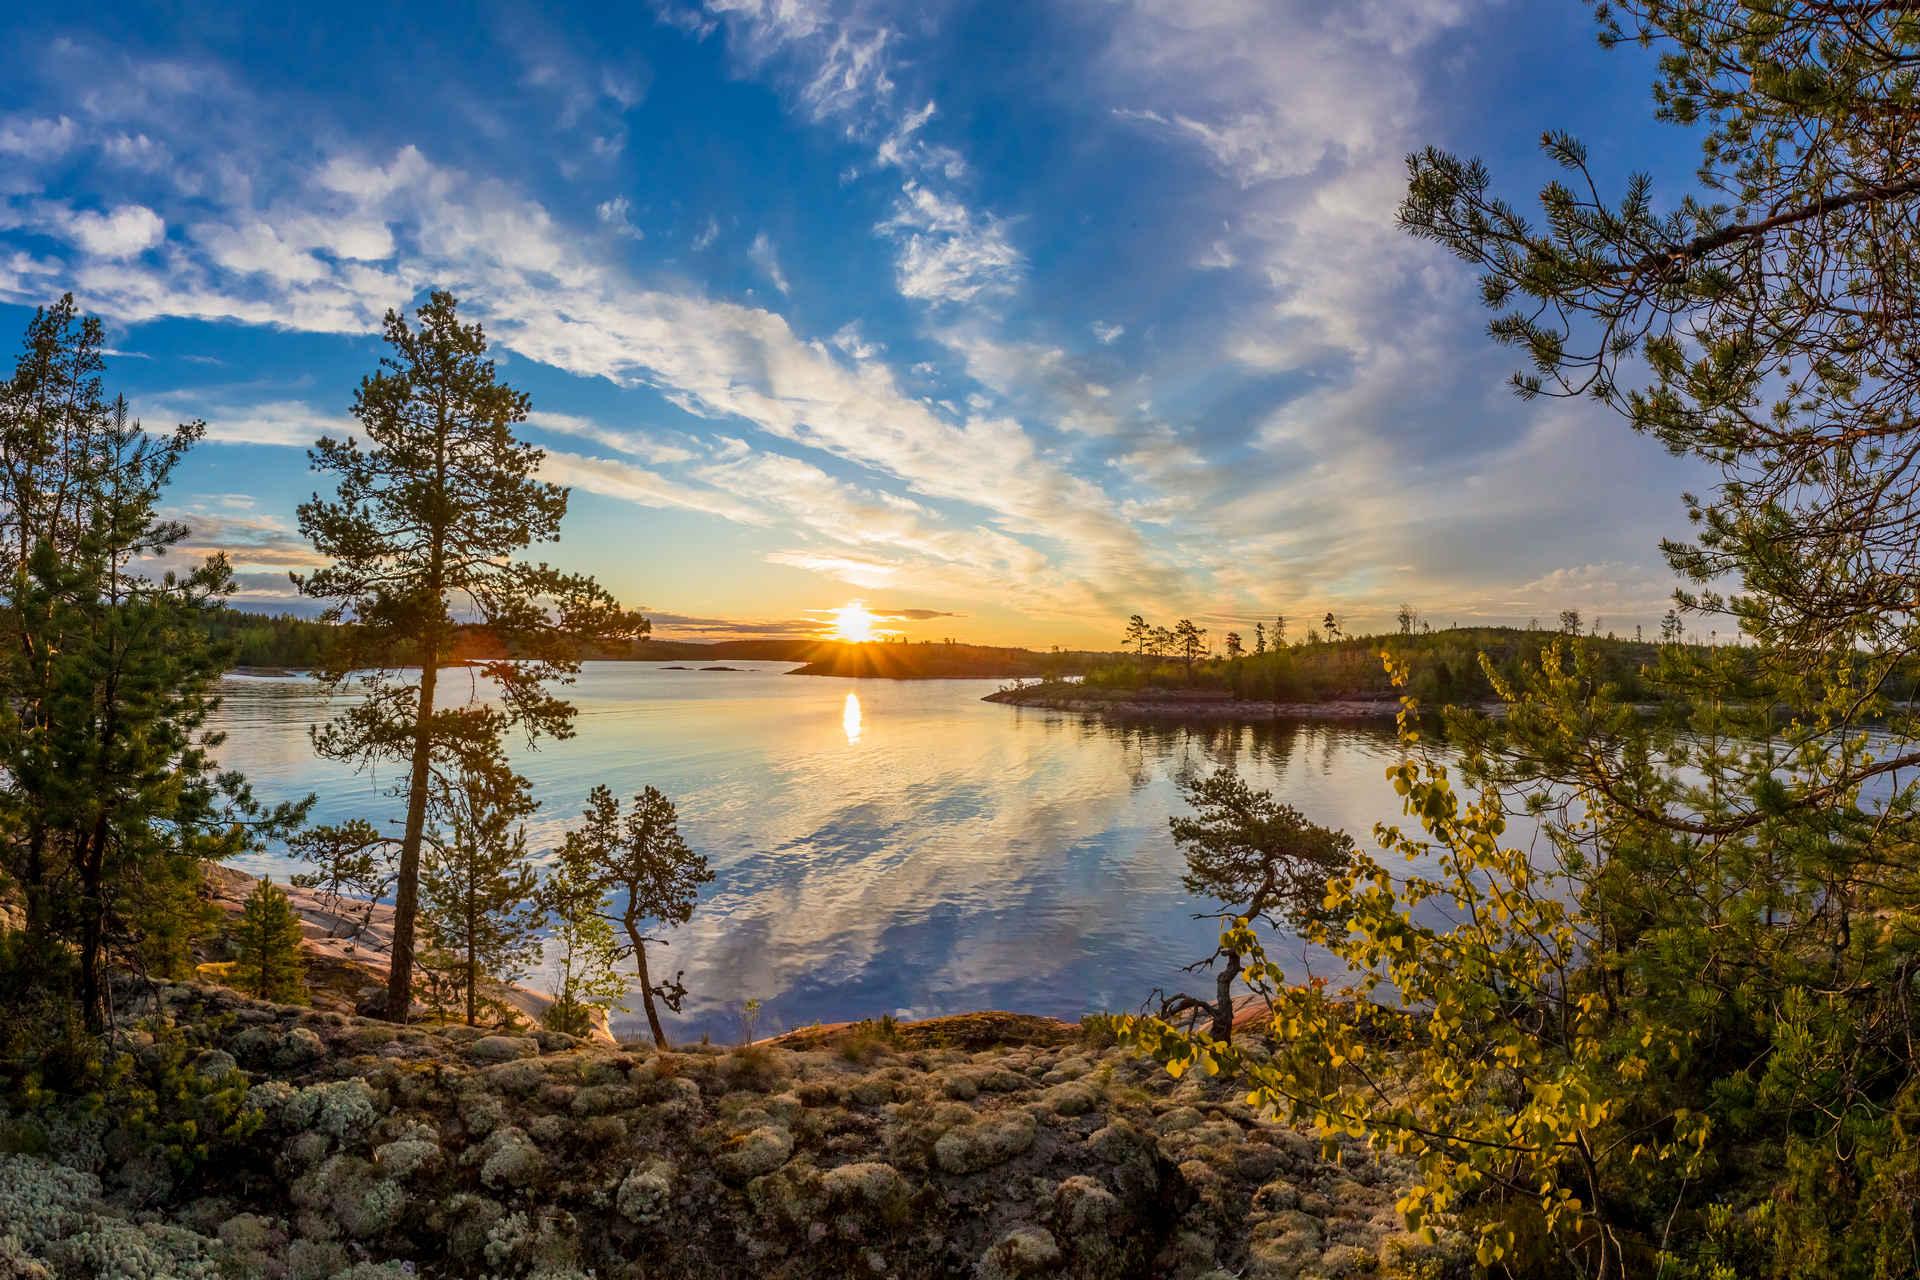 Карелия с севера на юг: леса, озёра и свежий ветер